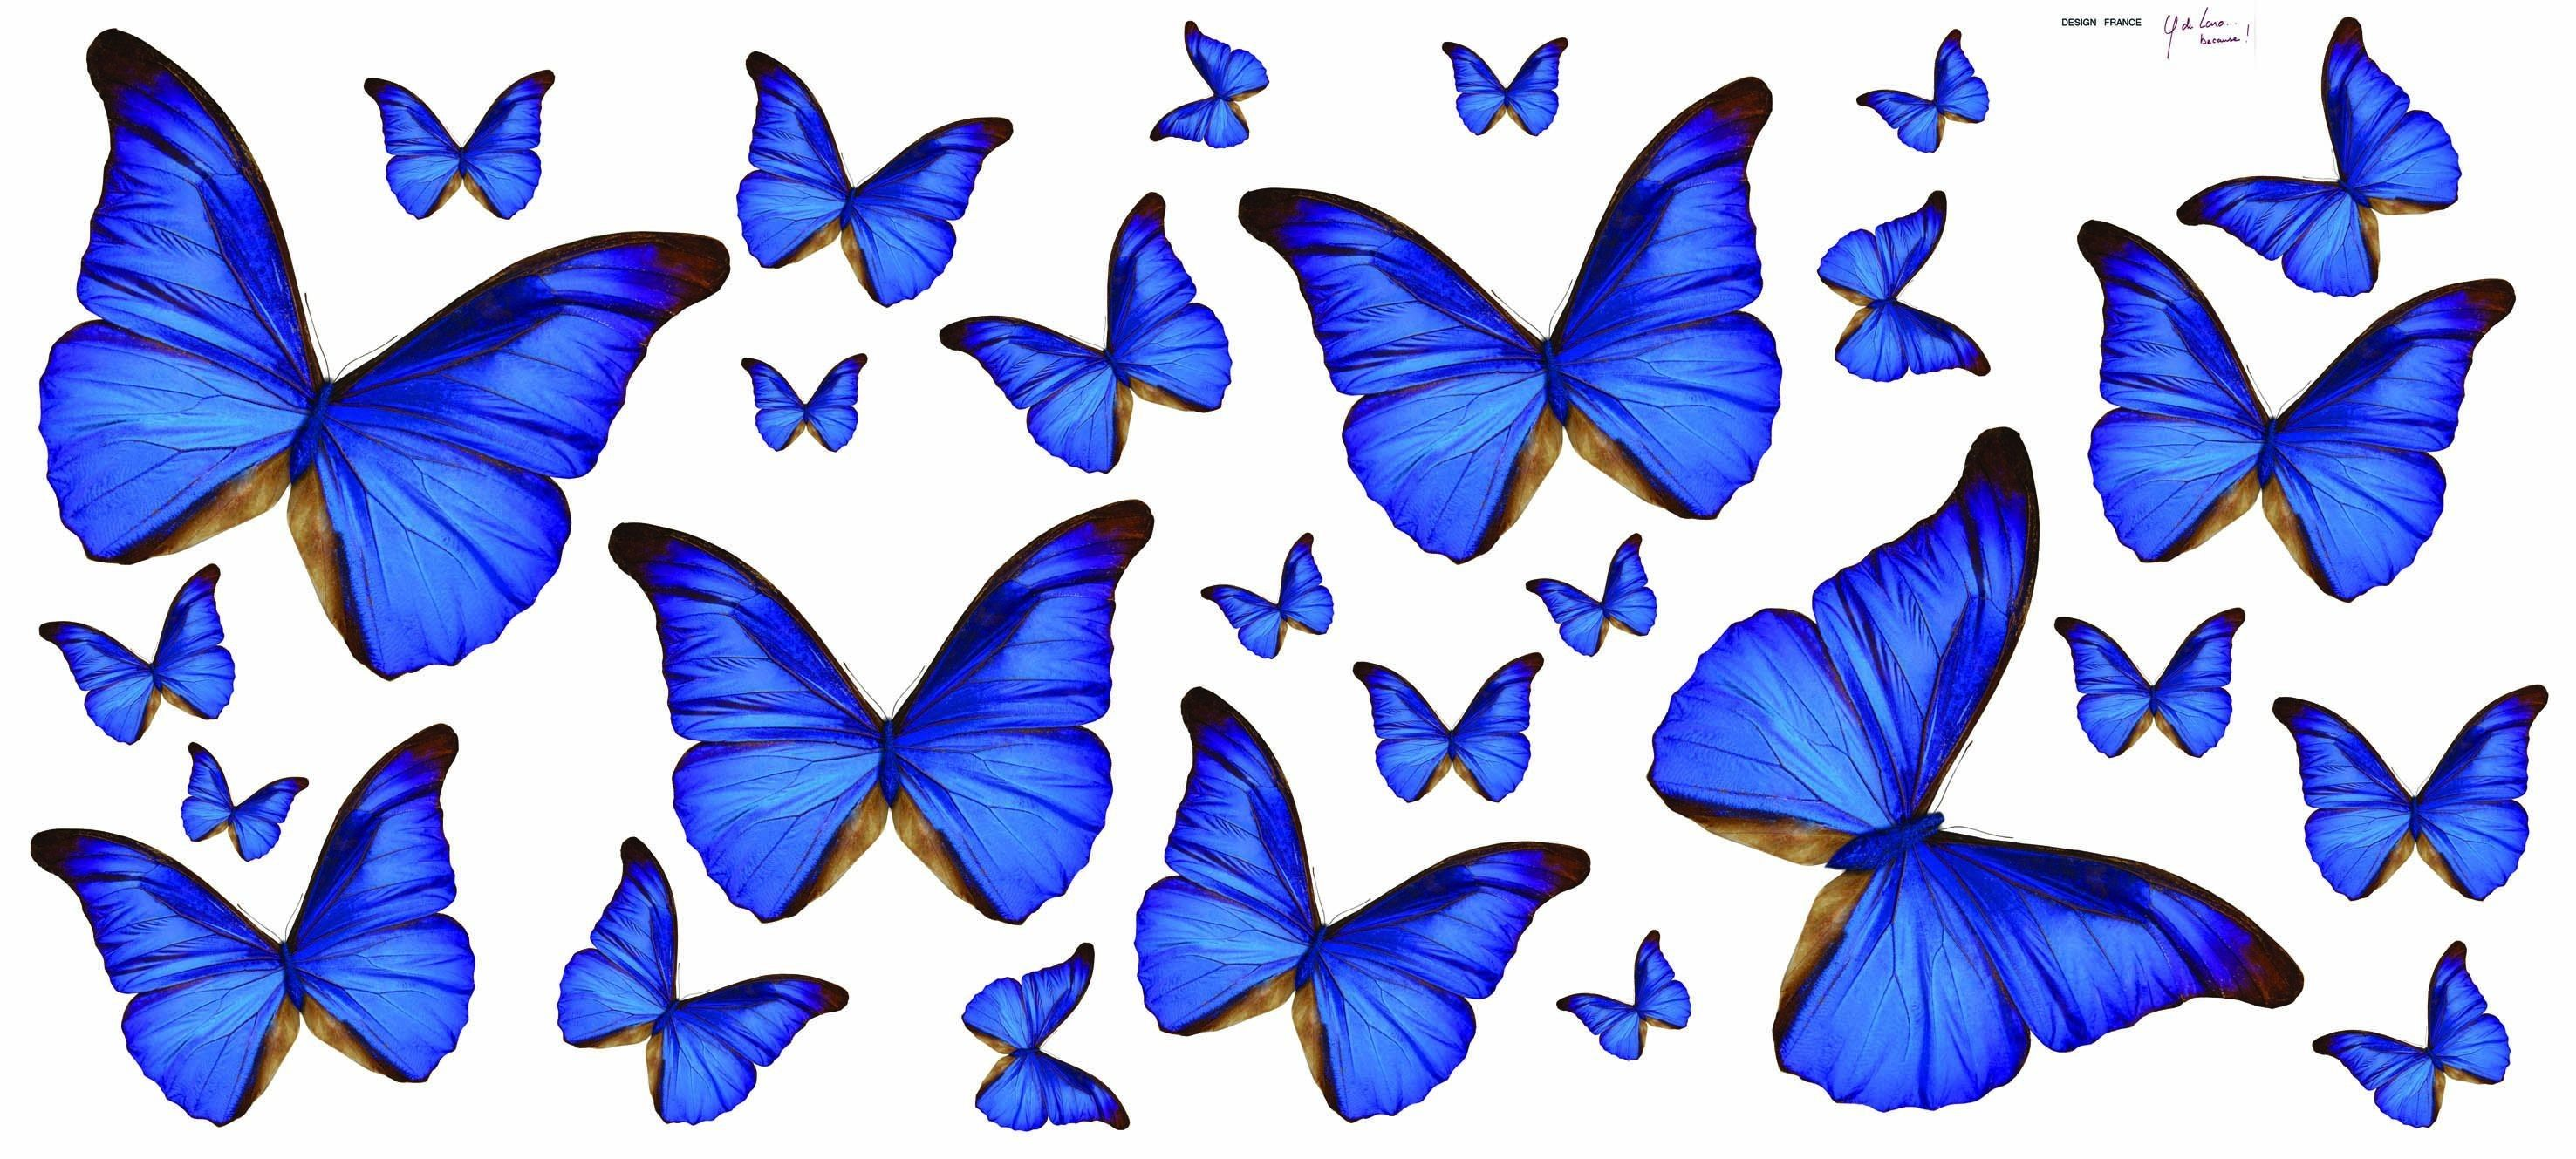 Blue Butterfly Wallpapers On Wallpaperdog Hd wallpapers for laptop aircraft. blue butterfly wallpapers on wallpaperdog